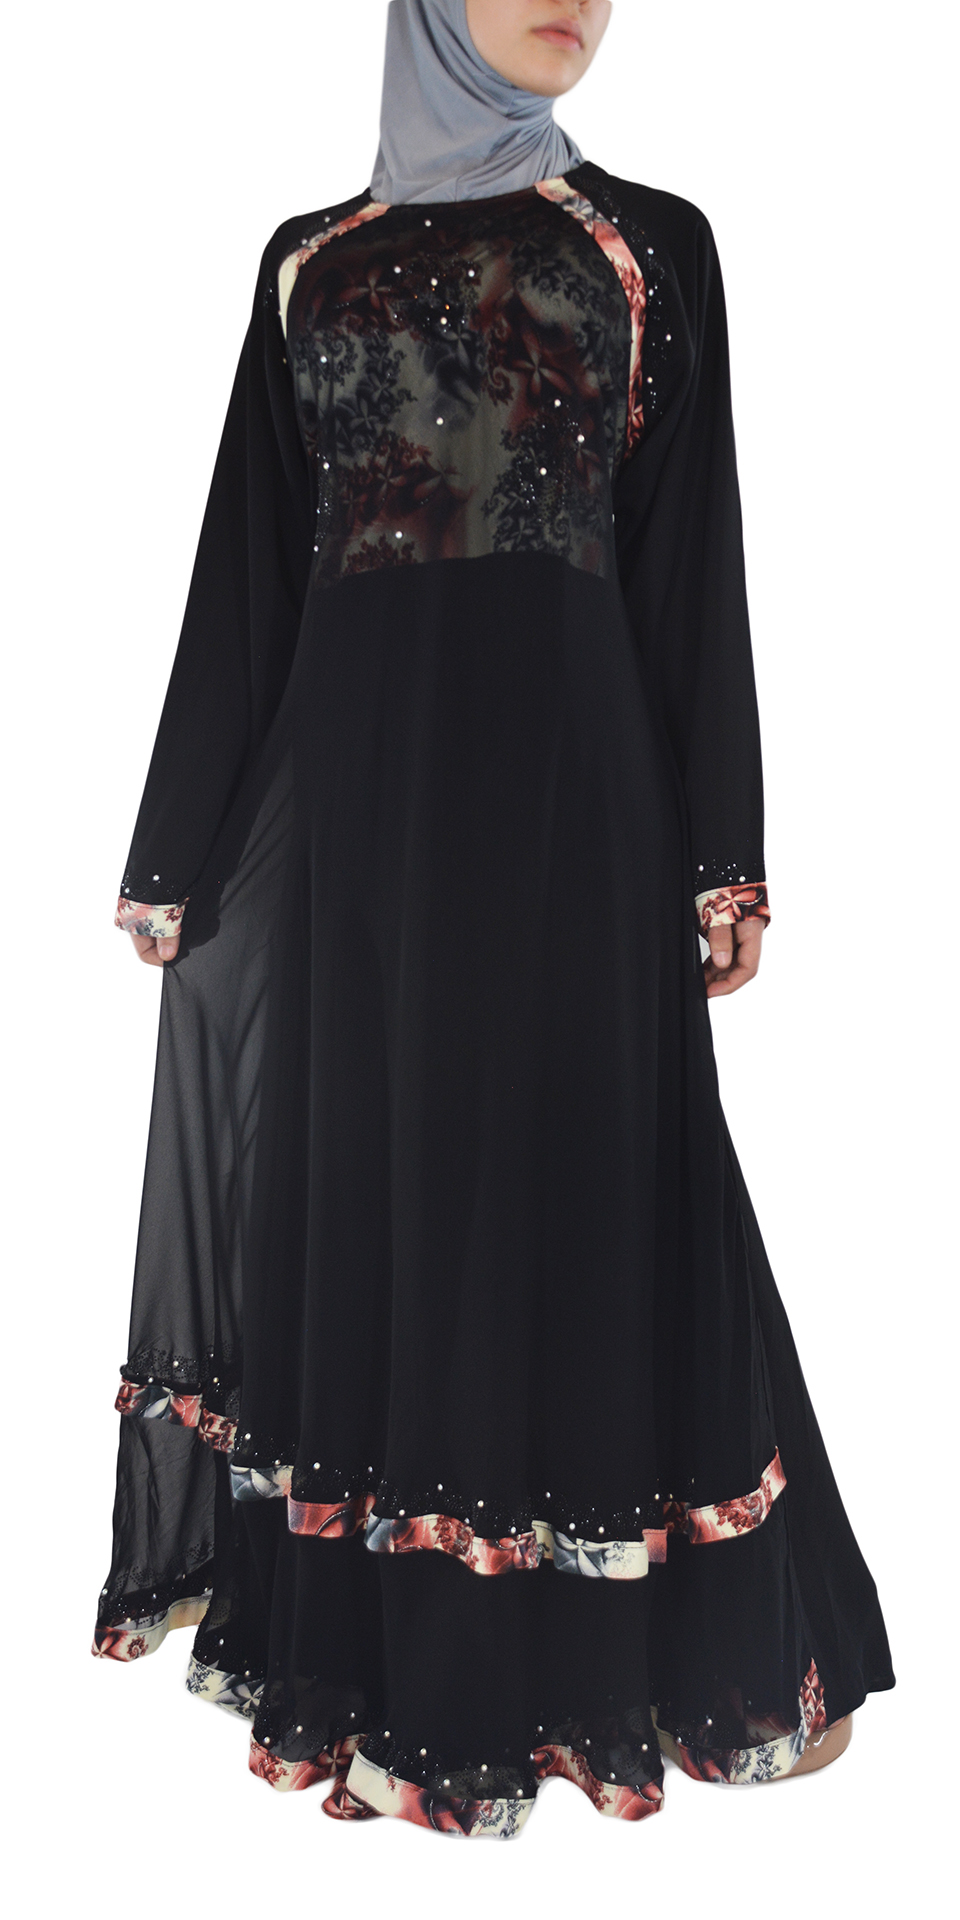 Nousha - Black and Tan Chic Abaya Spread